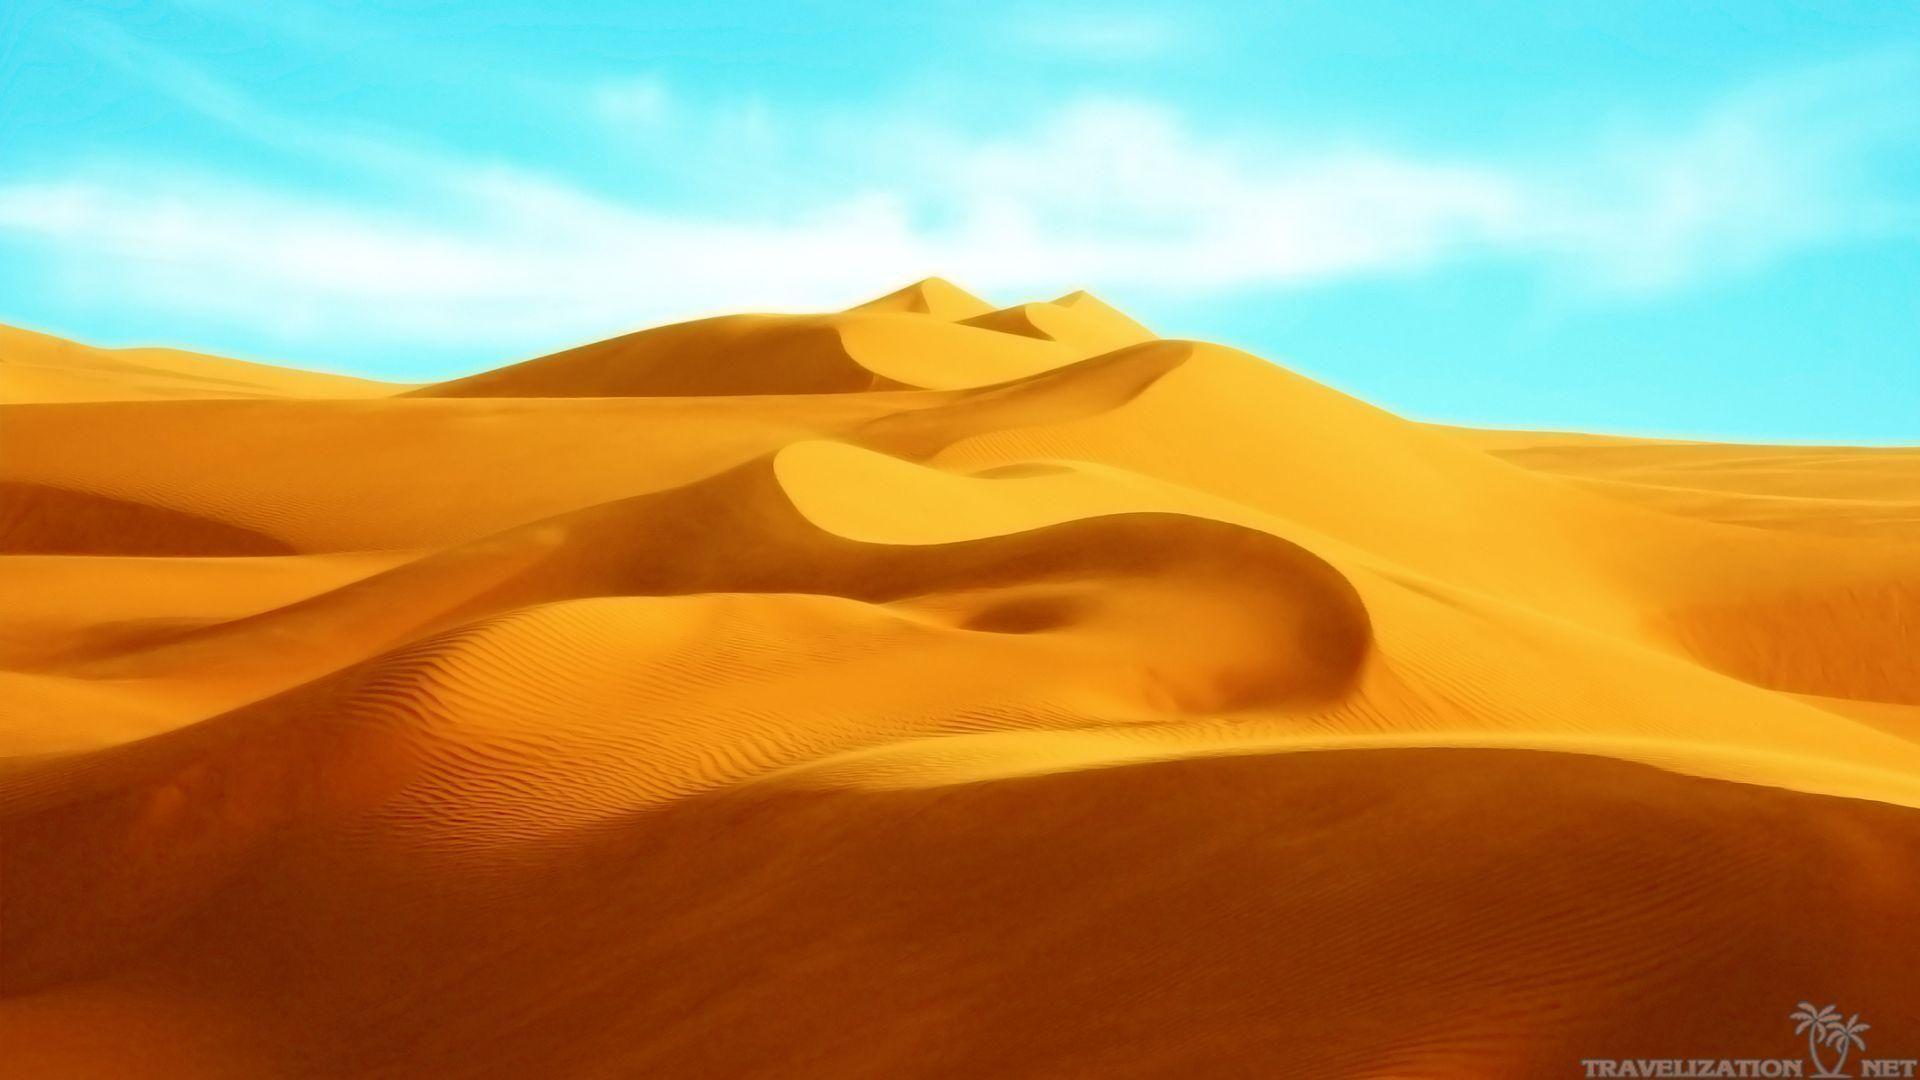 Sahara Wallpapers Desktop Wallpaper Hd Wallpper Desert Sahara In 2020 Sahara Desert Sahara Natural Landmarks